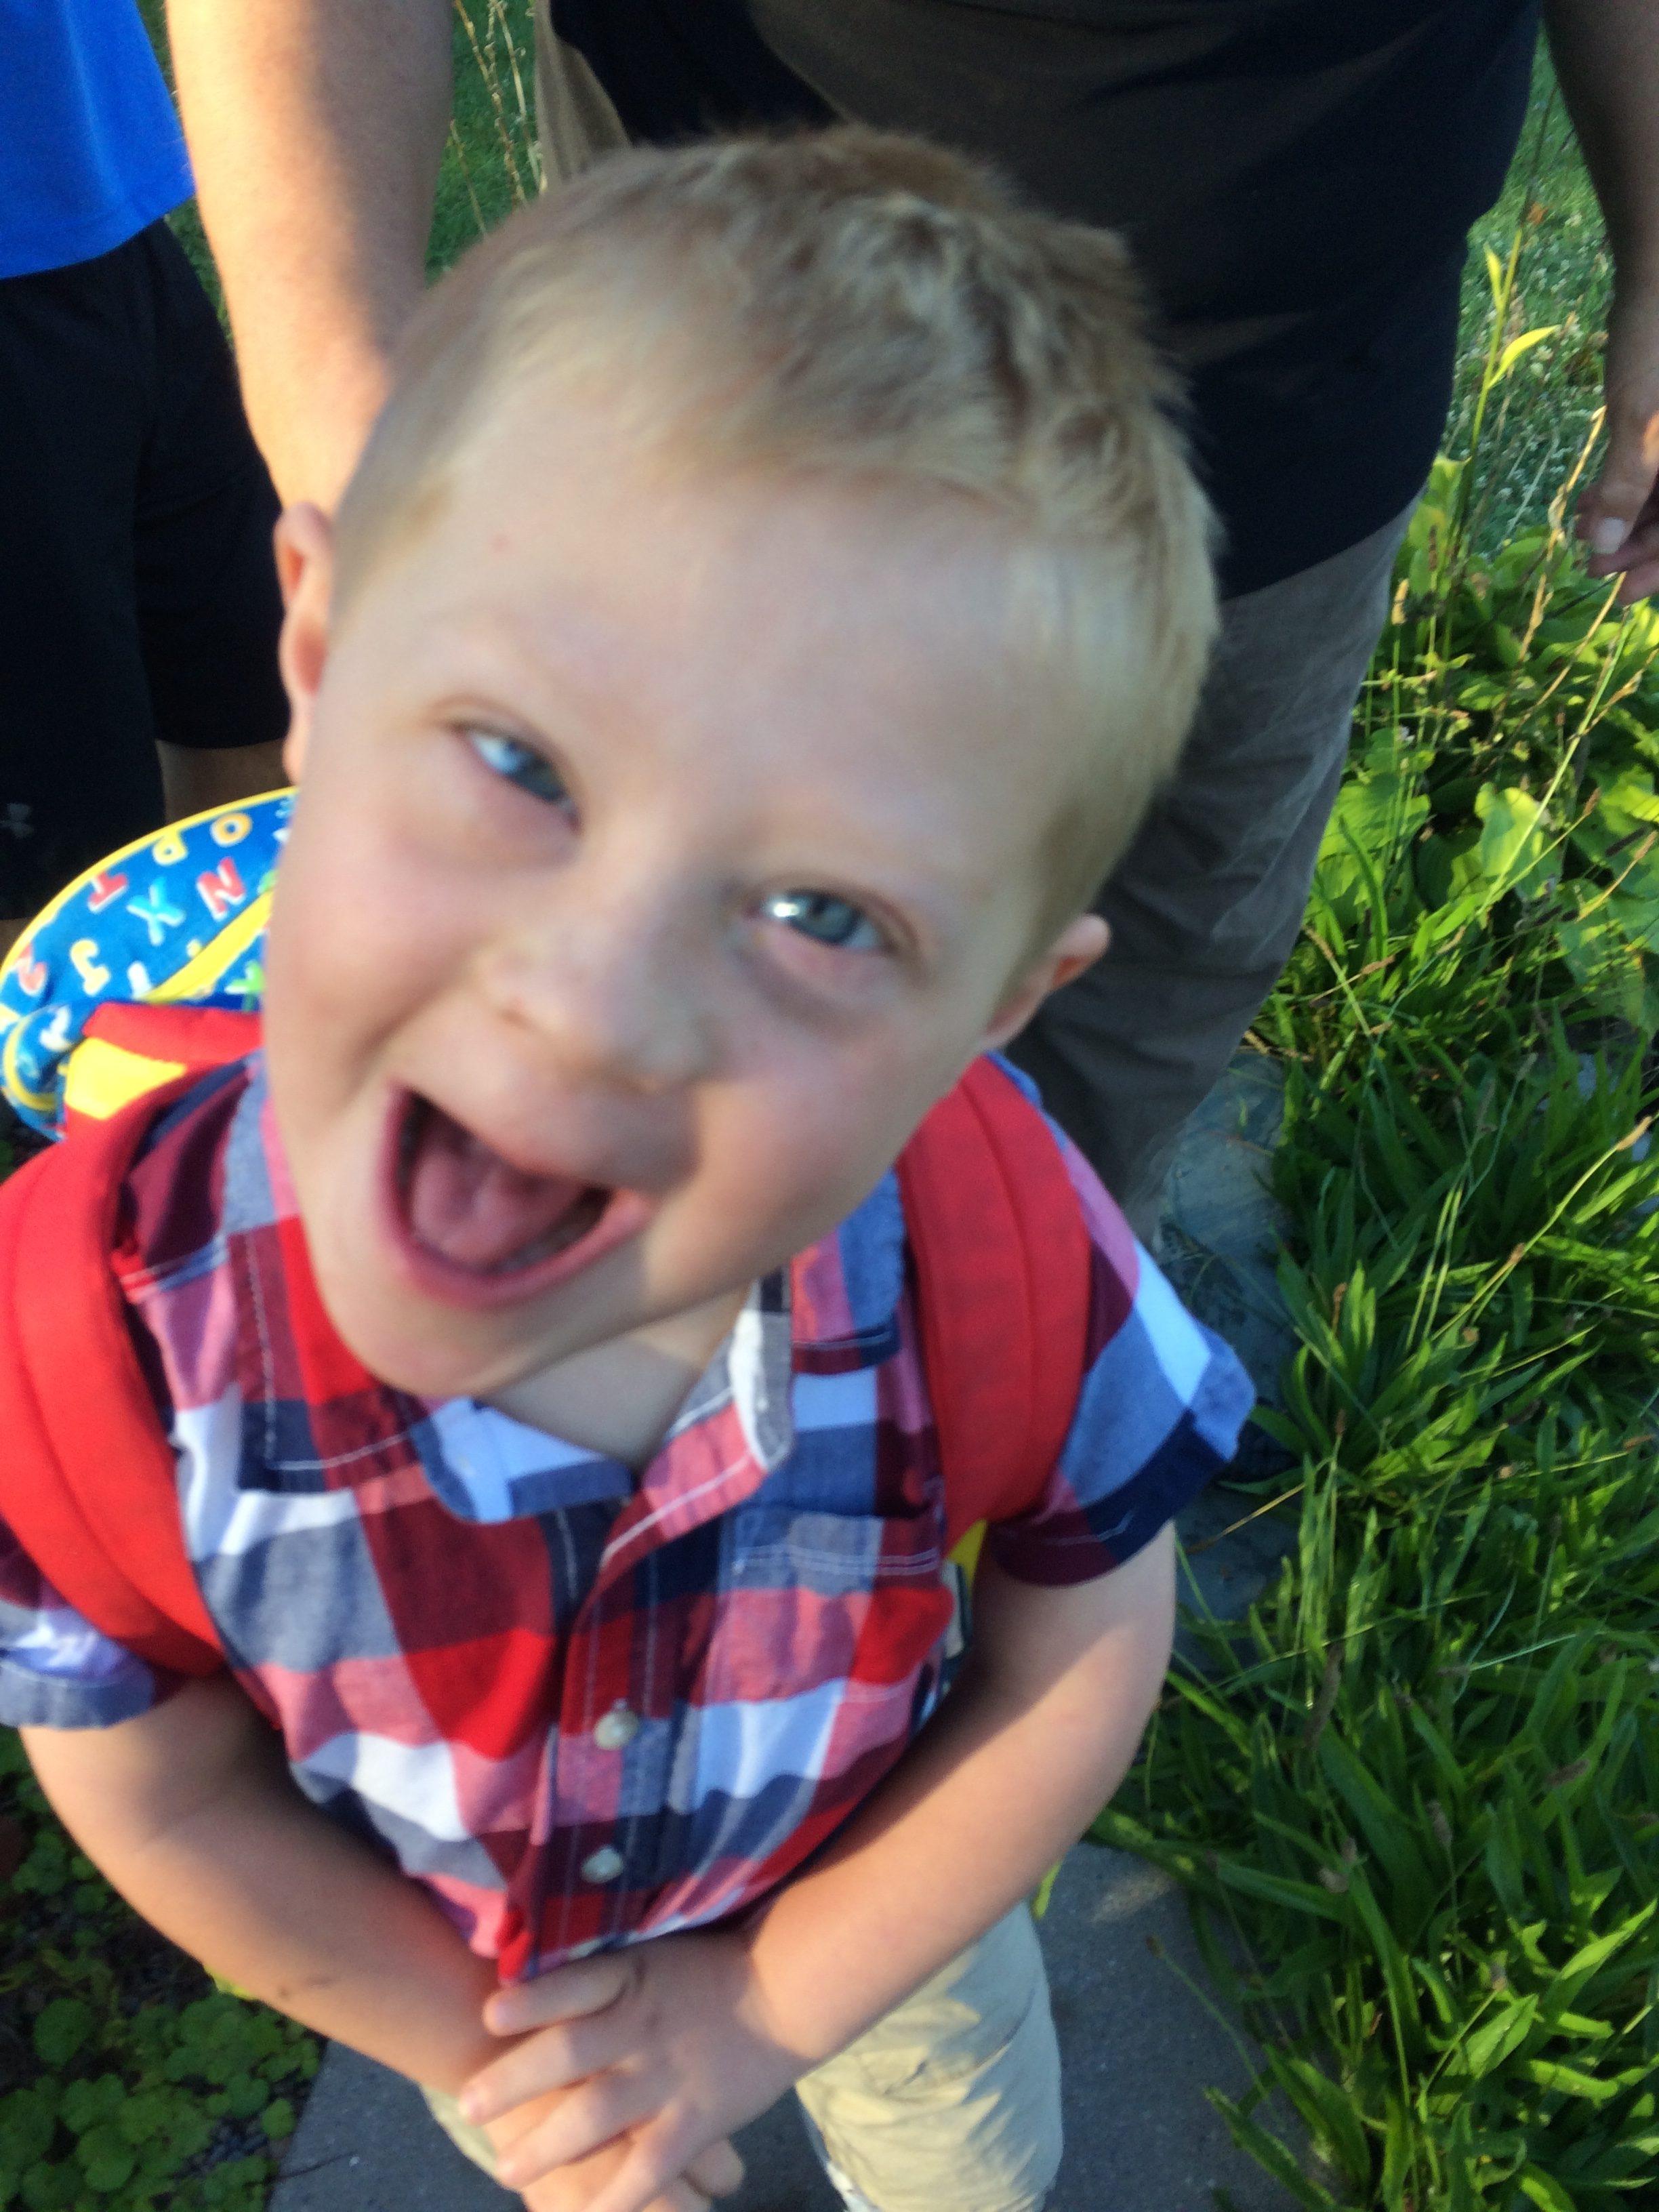 Beth's son making a goofy happy face.